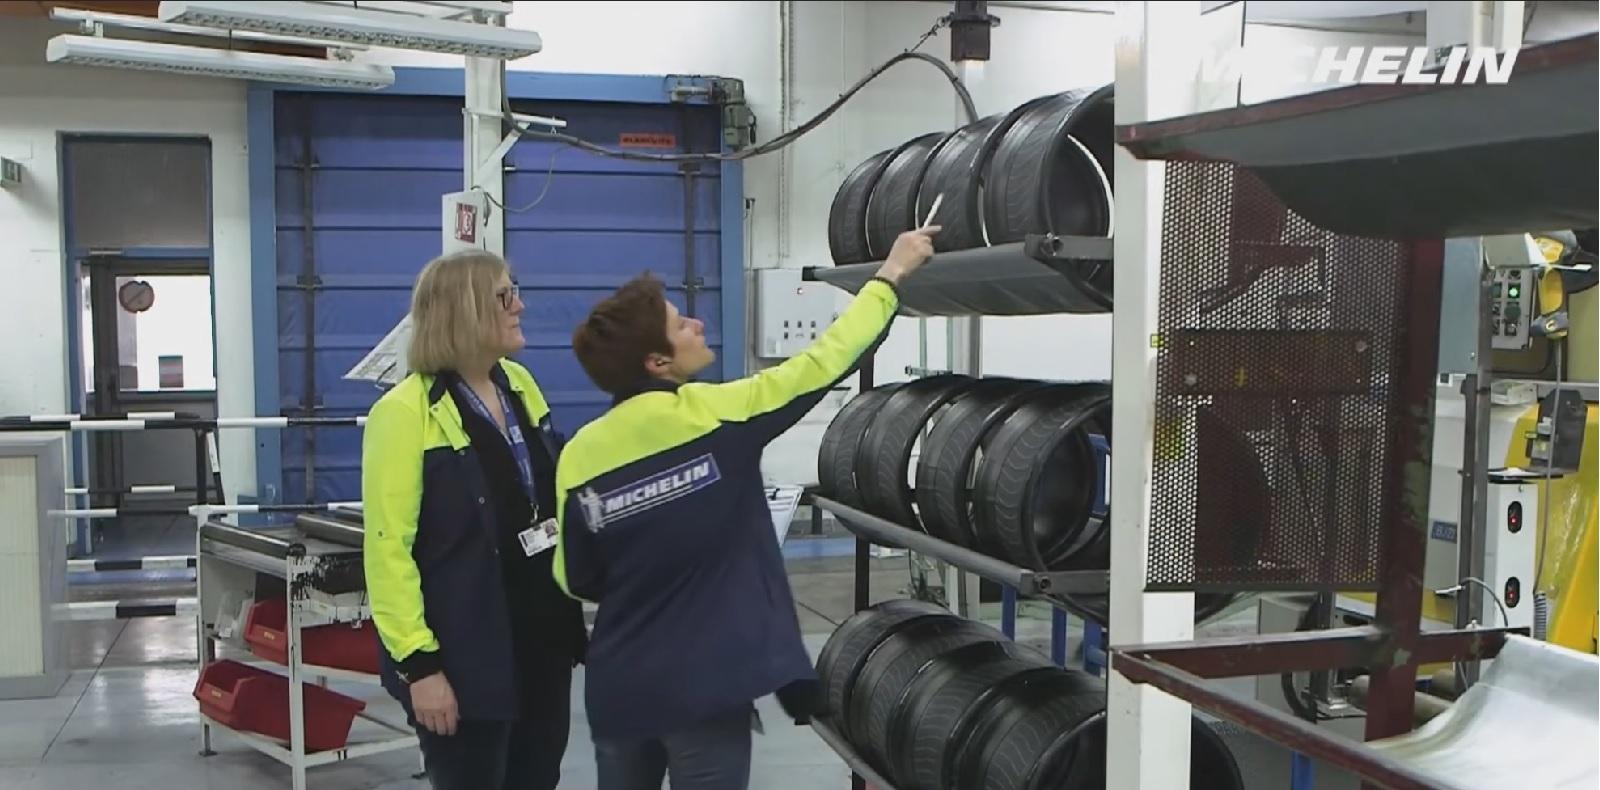 Careers for women in industry